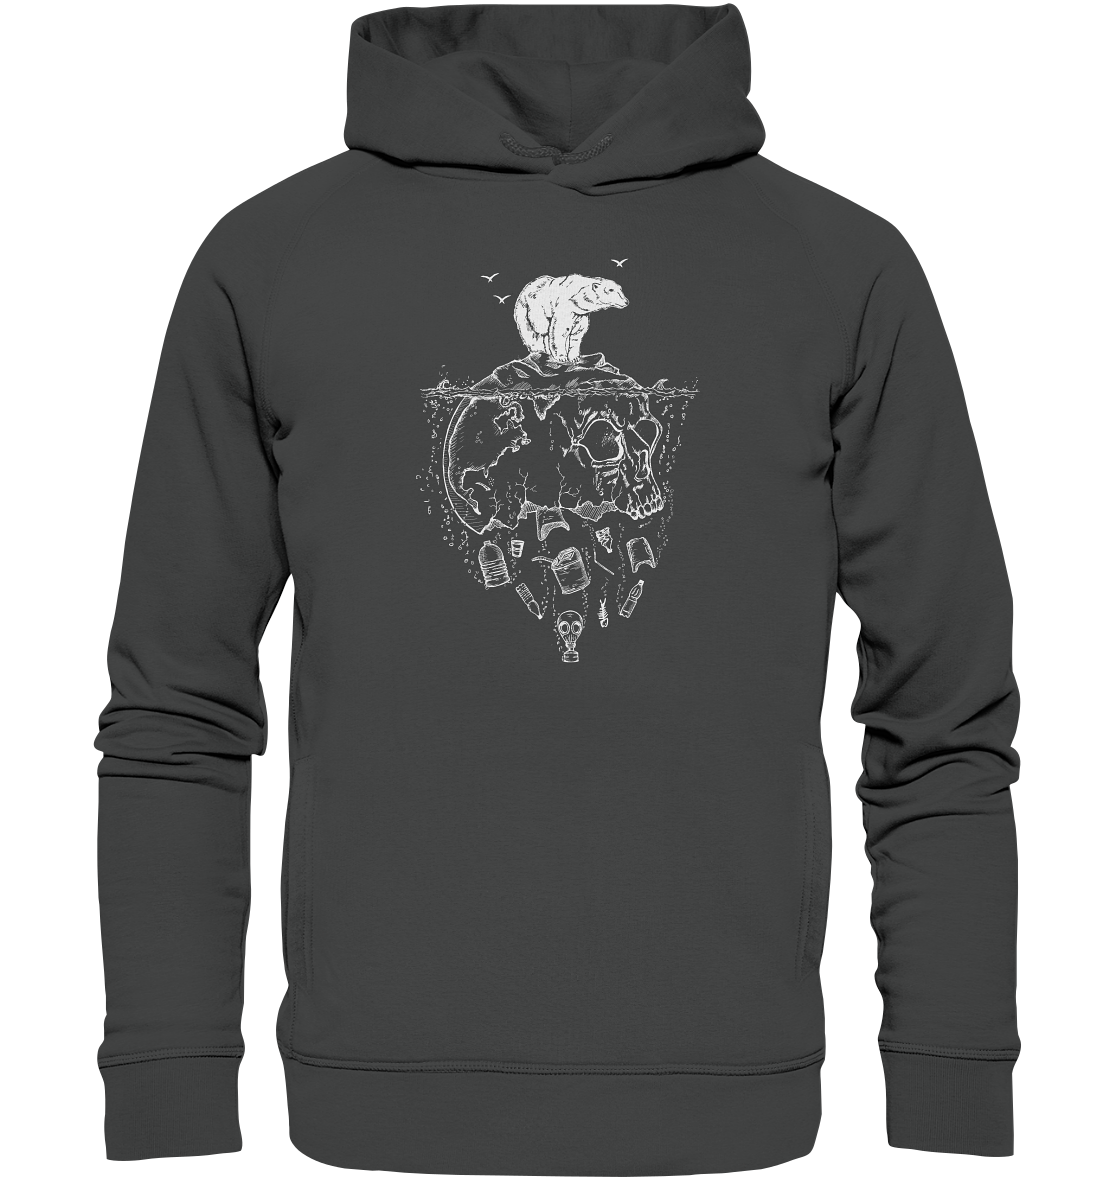 front-organic-fashion-hoodie-444545-1116x-5.png